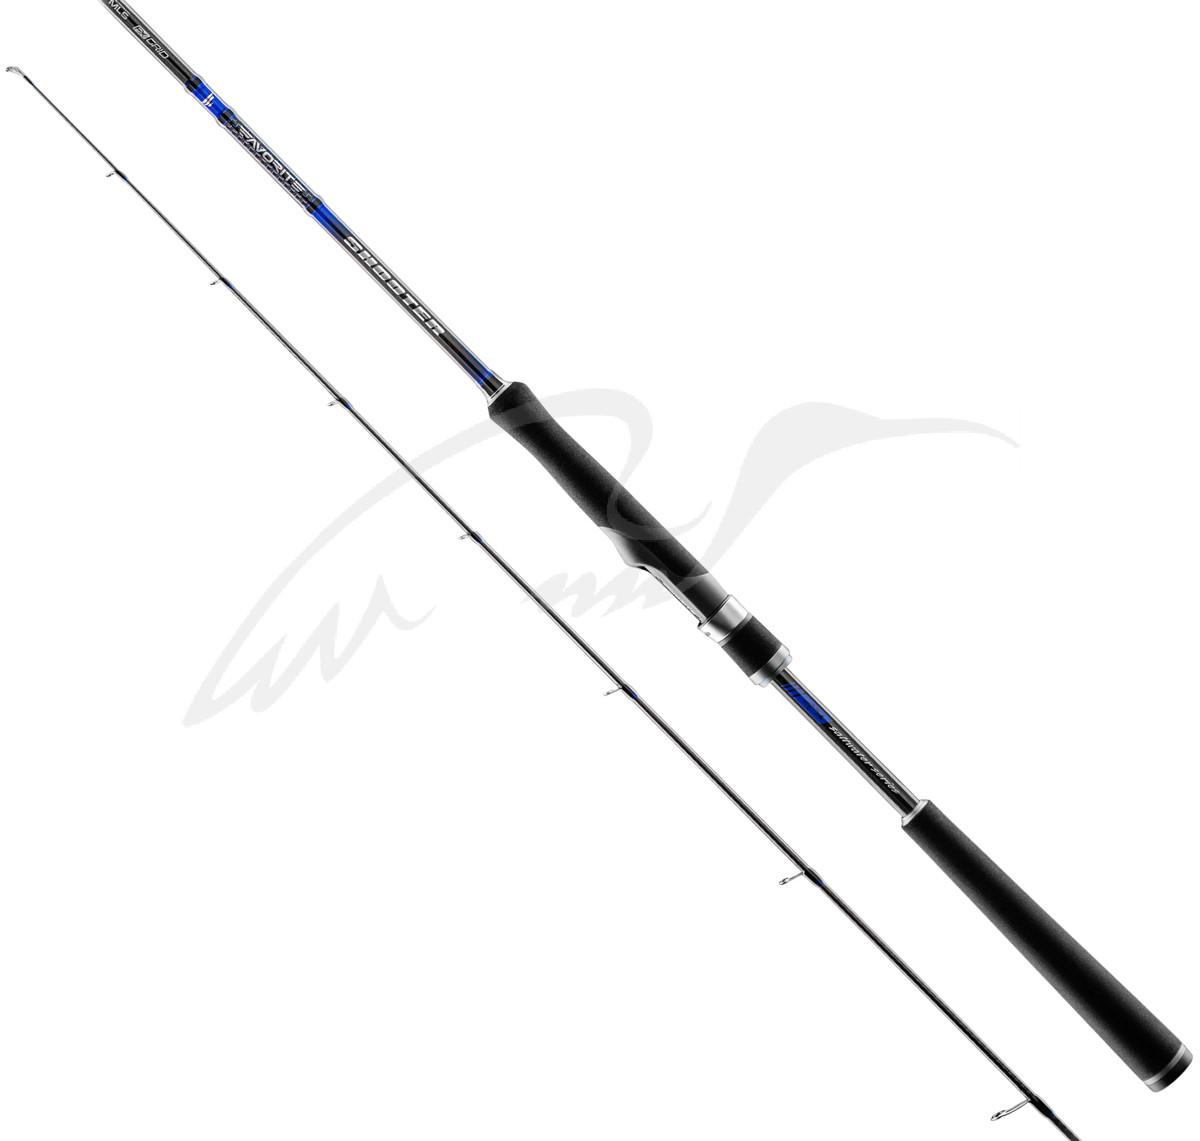 Спінінг Favorite SW Shooter SSH-862M 2.62 m 7-28g PE #0.8-1.5 Fast